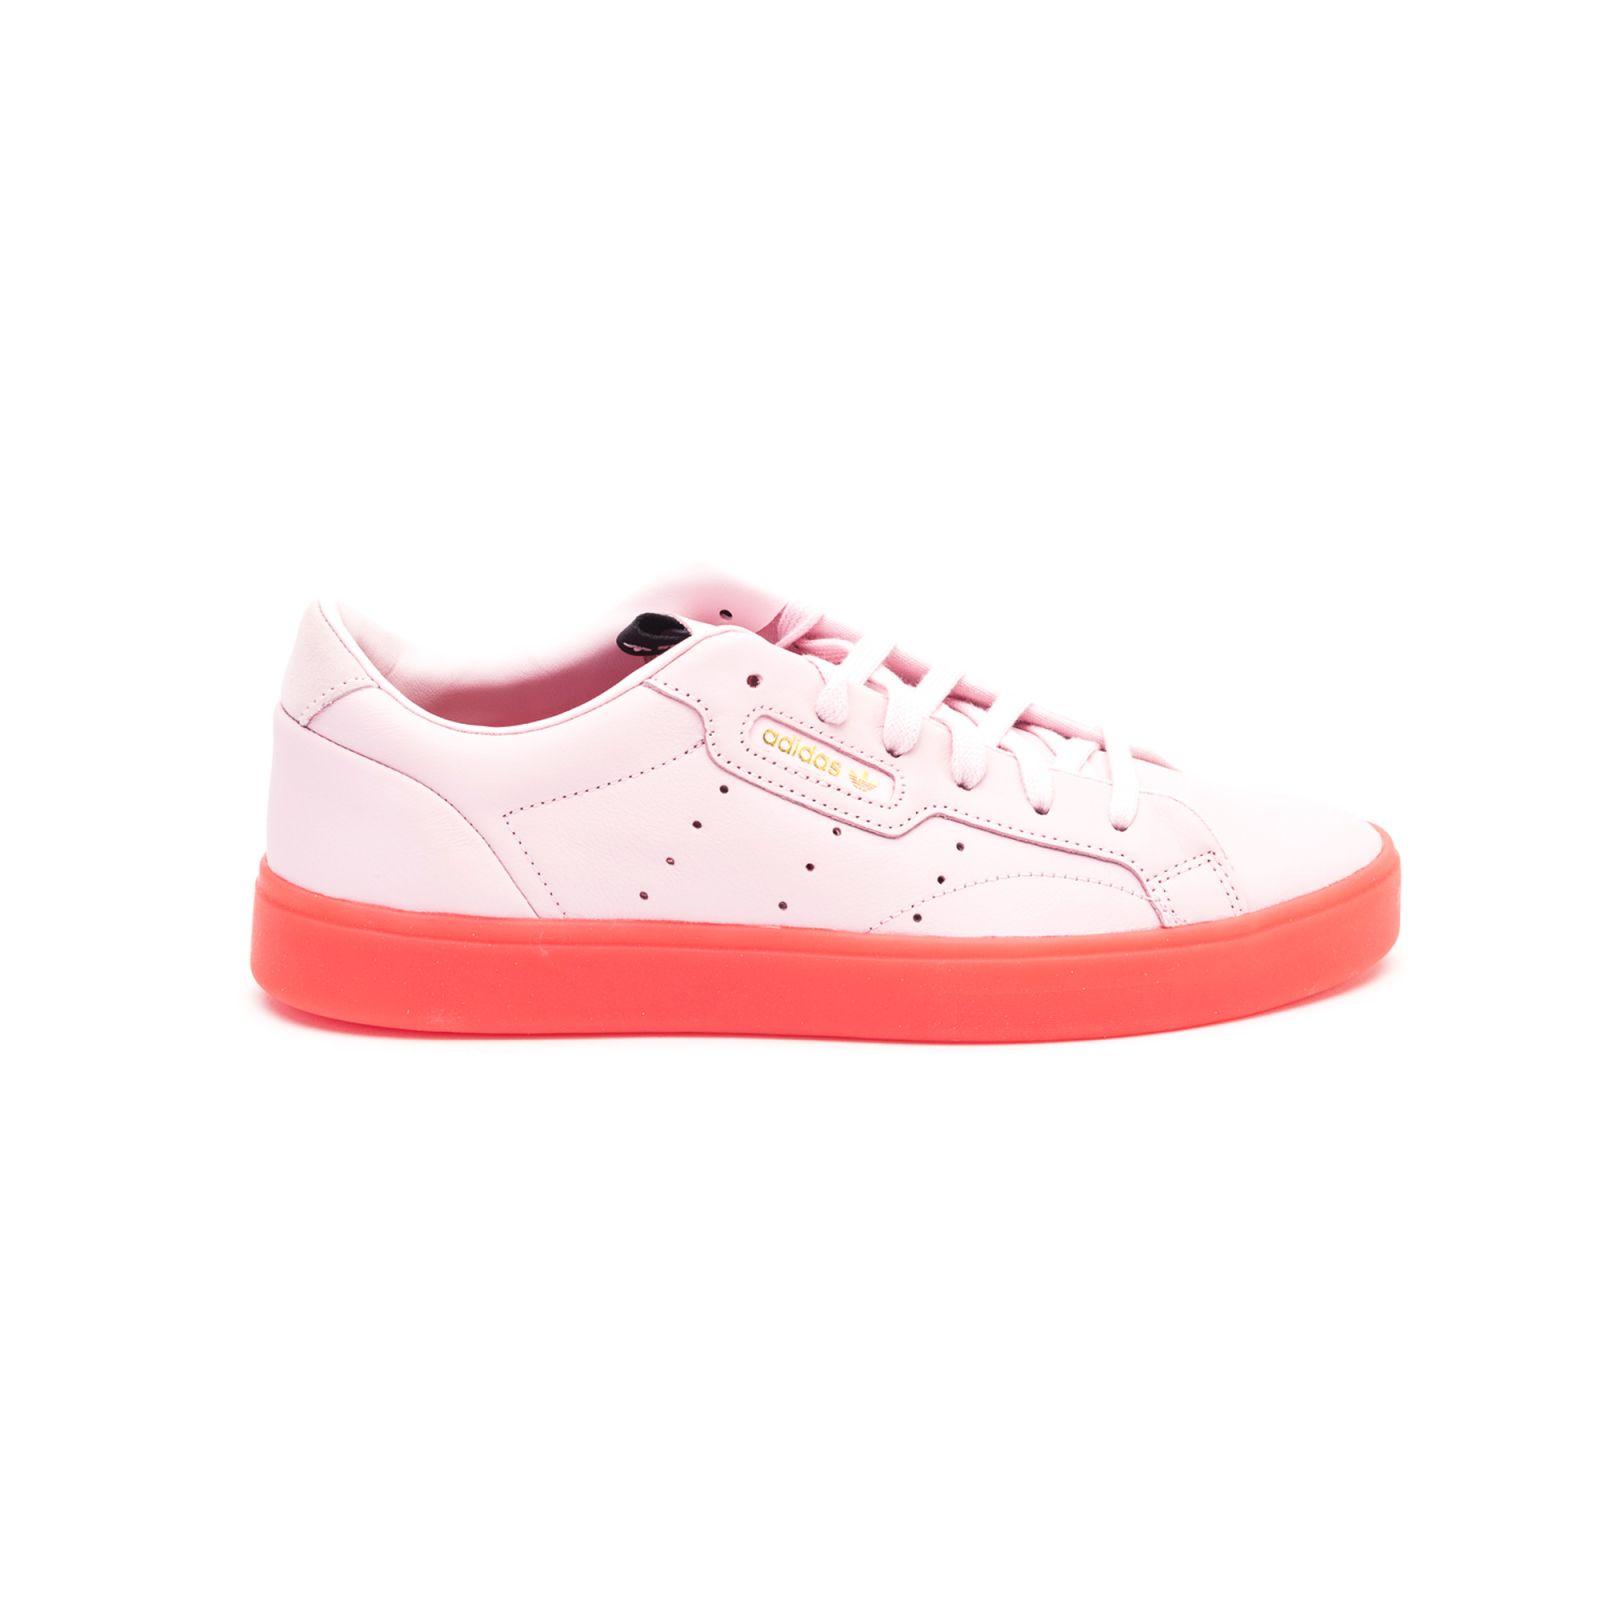 211ca9bba Adidas Adidas Sleek Leather Sneakers - Pink - 10950073 | italist